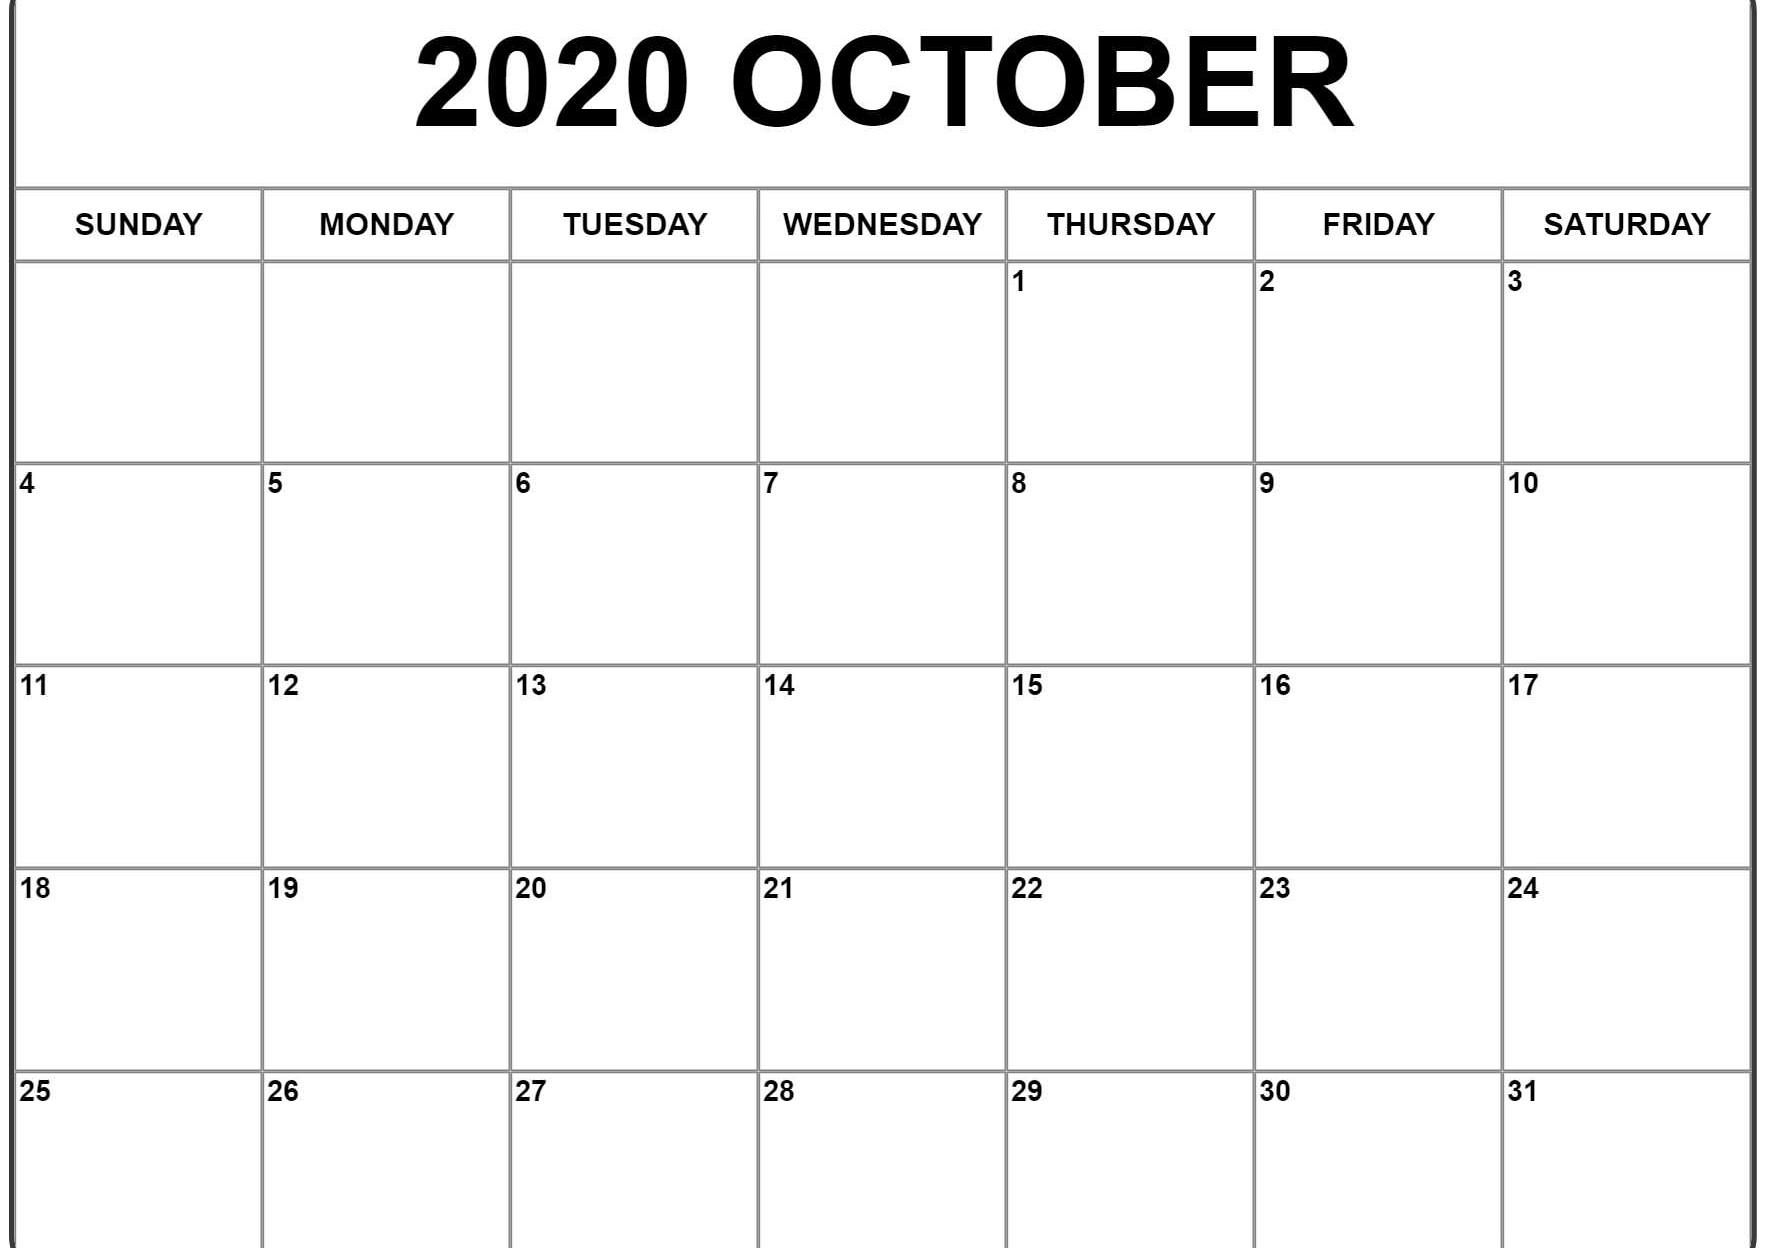 October 2020 Calendar Pdf, Word, Excel Template 2 | Calendar